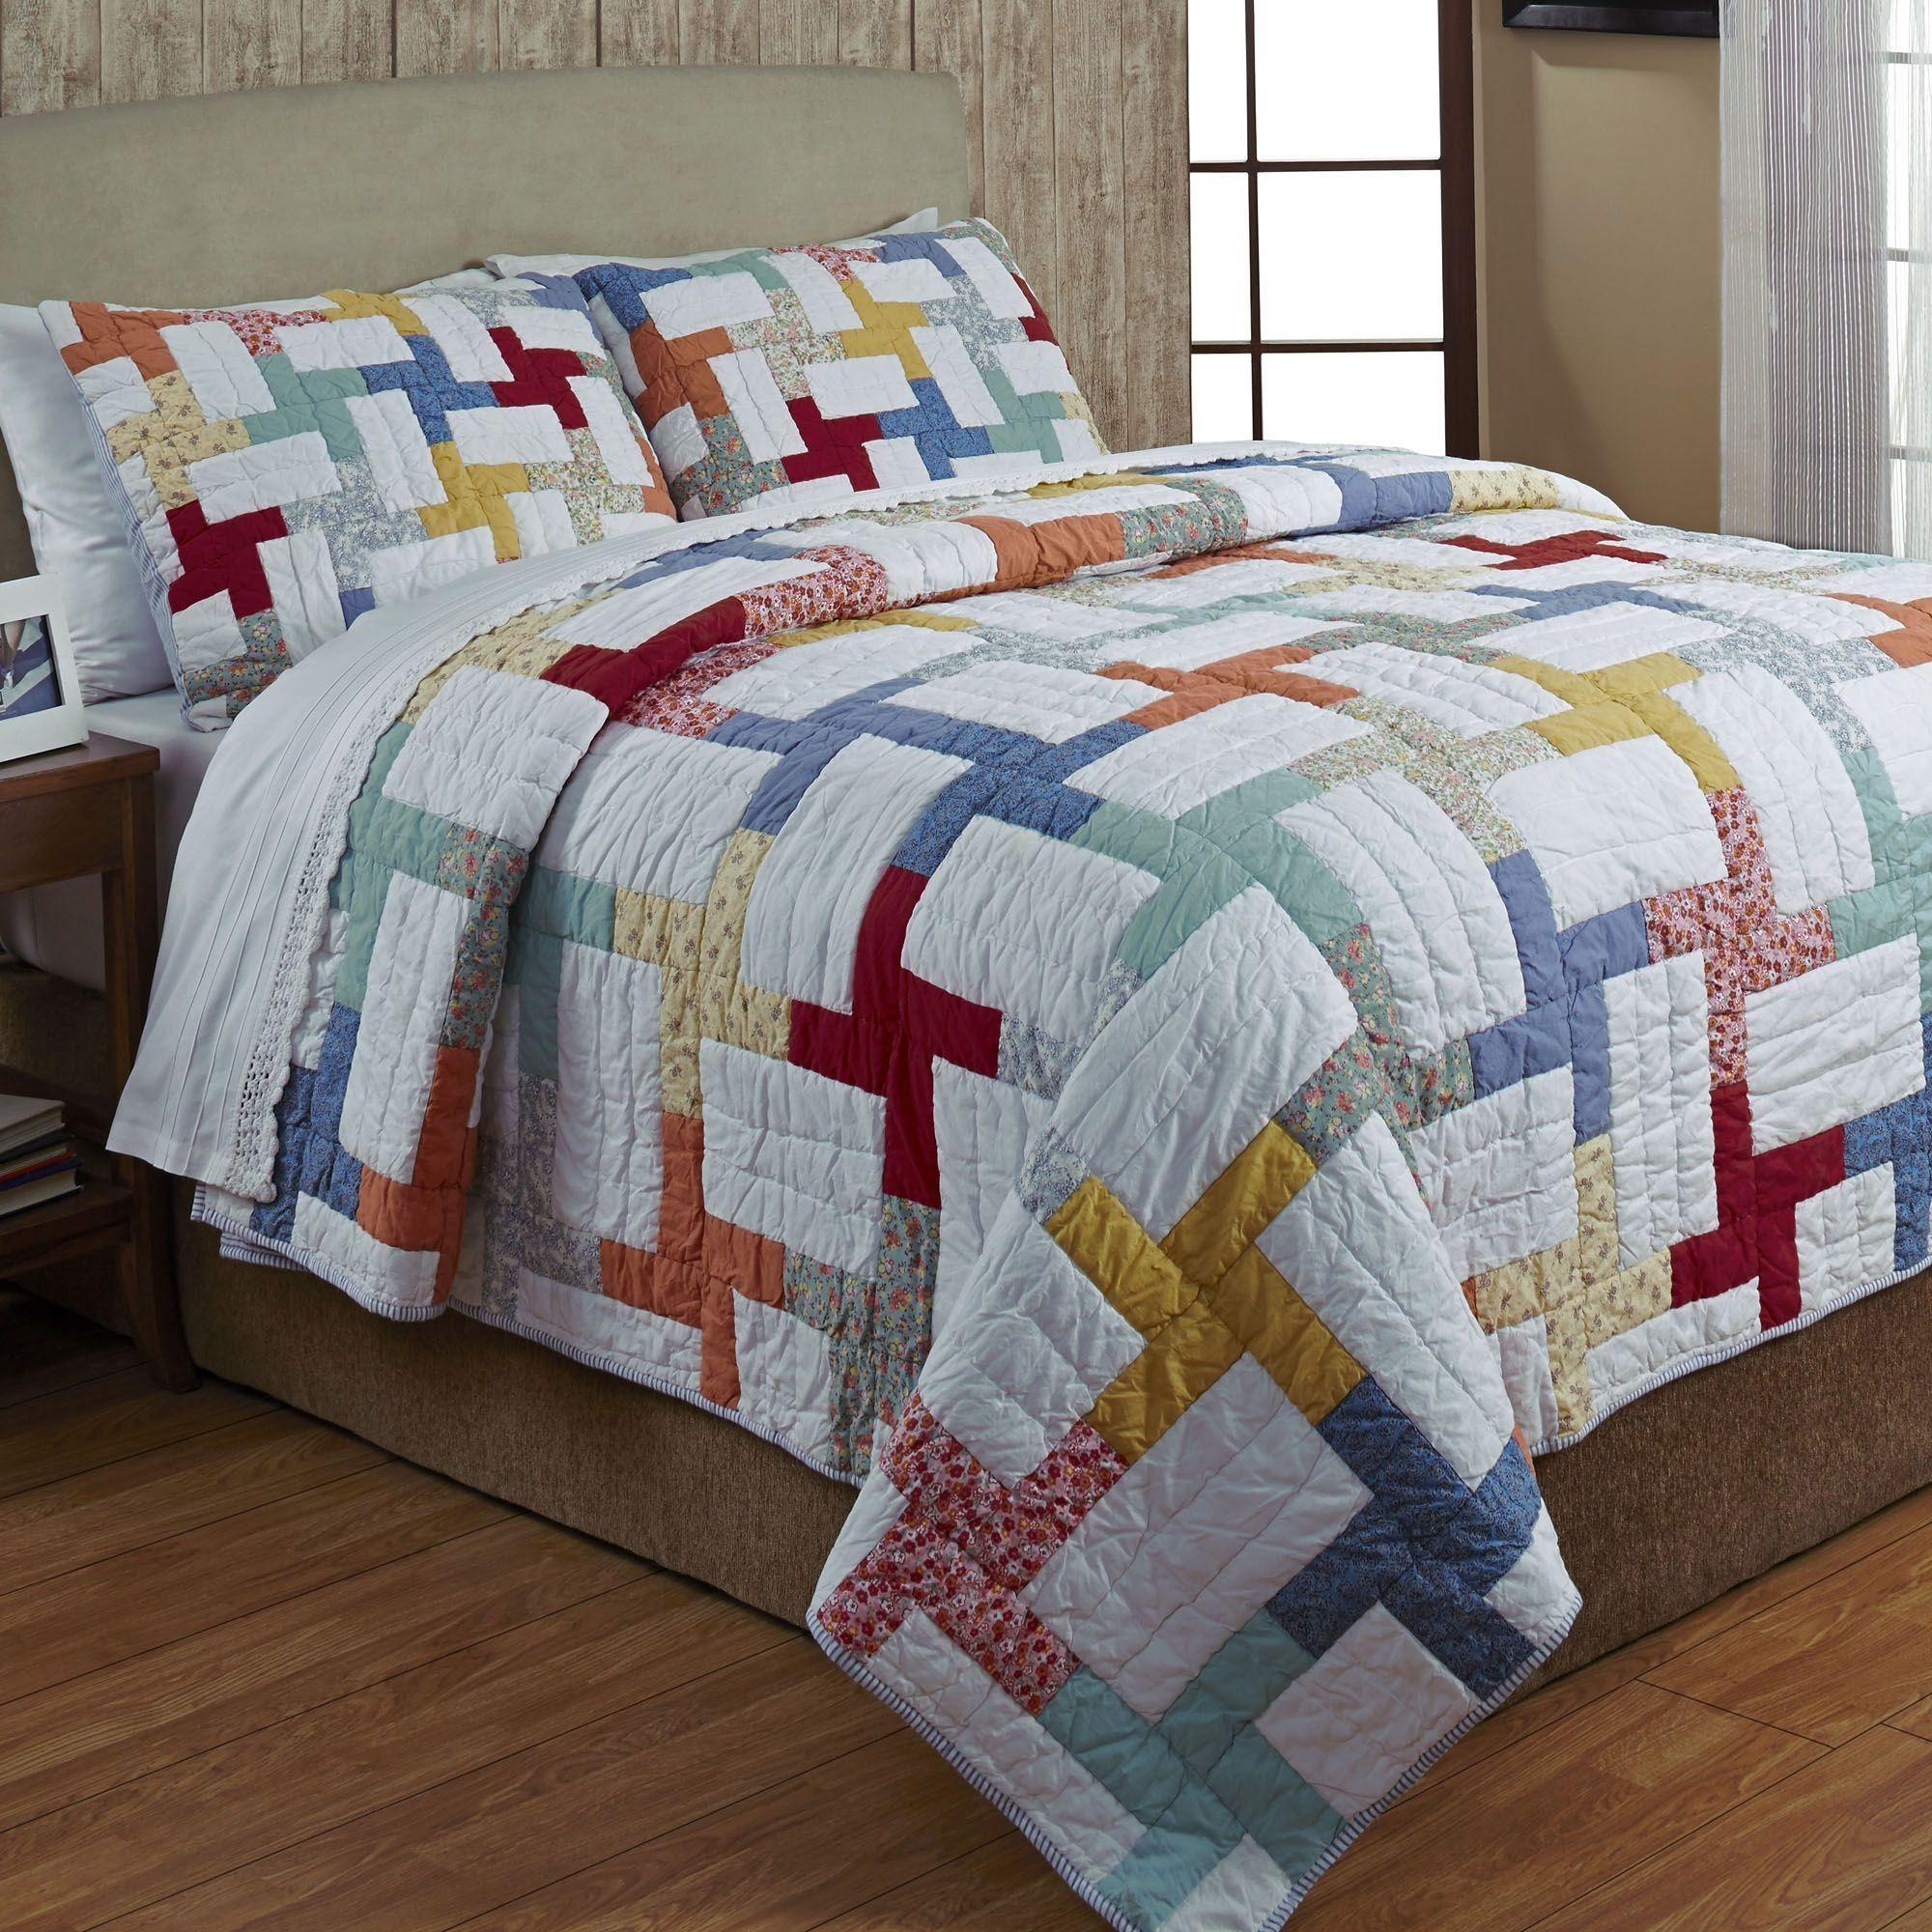 Maylen Multicolored Patchwork Quilt Set : quilted patchwork bedspreads - Adamdwight.com